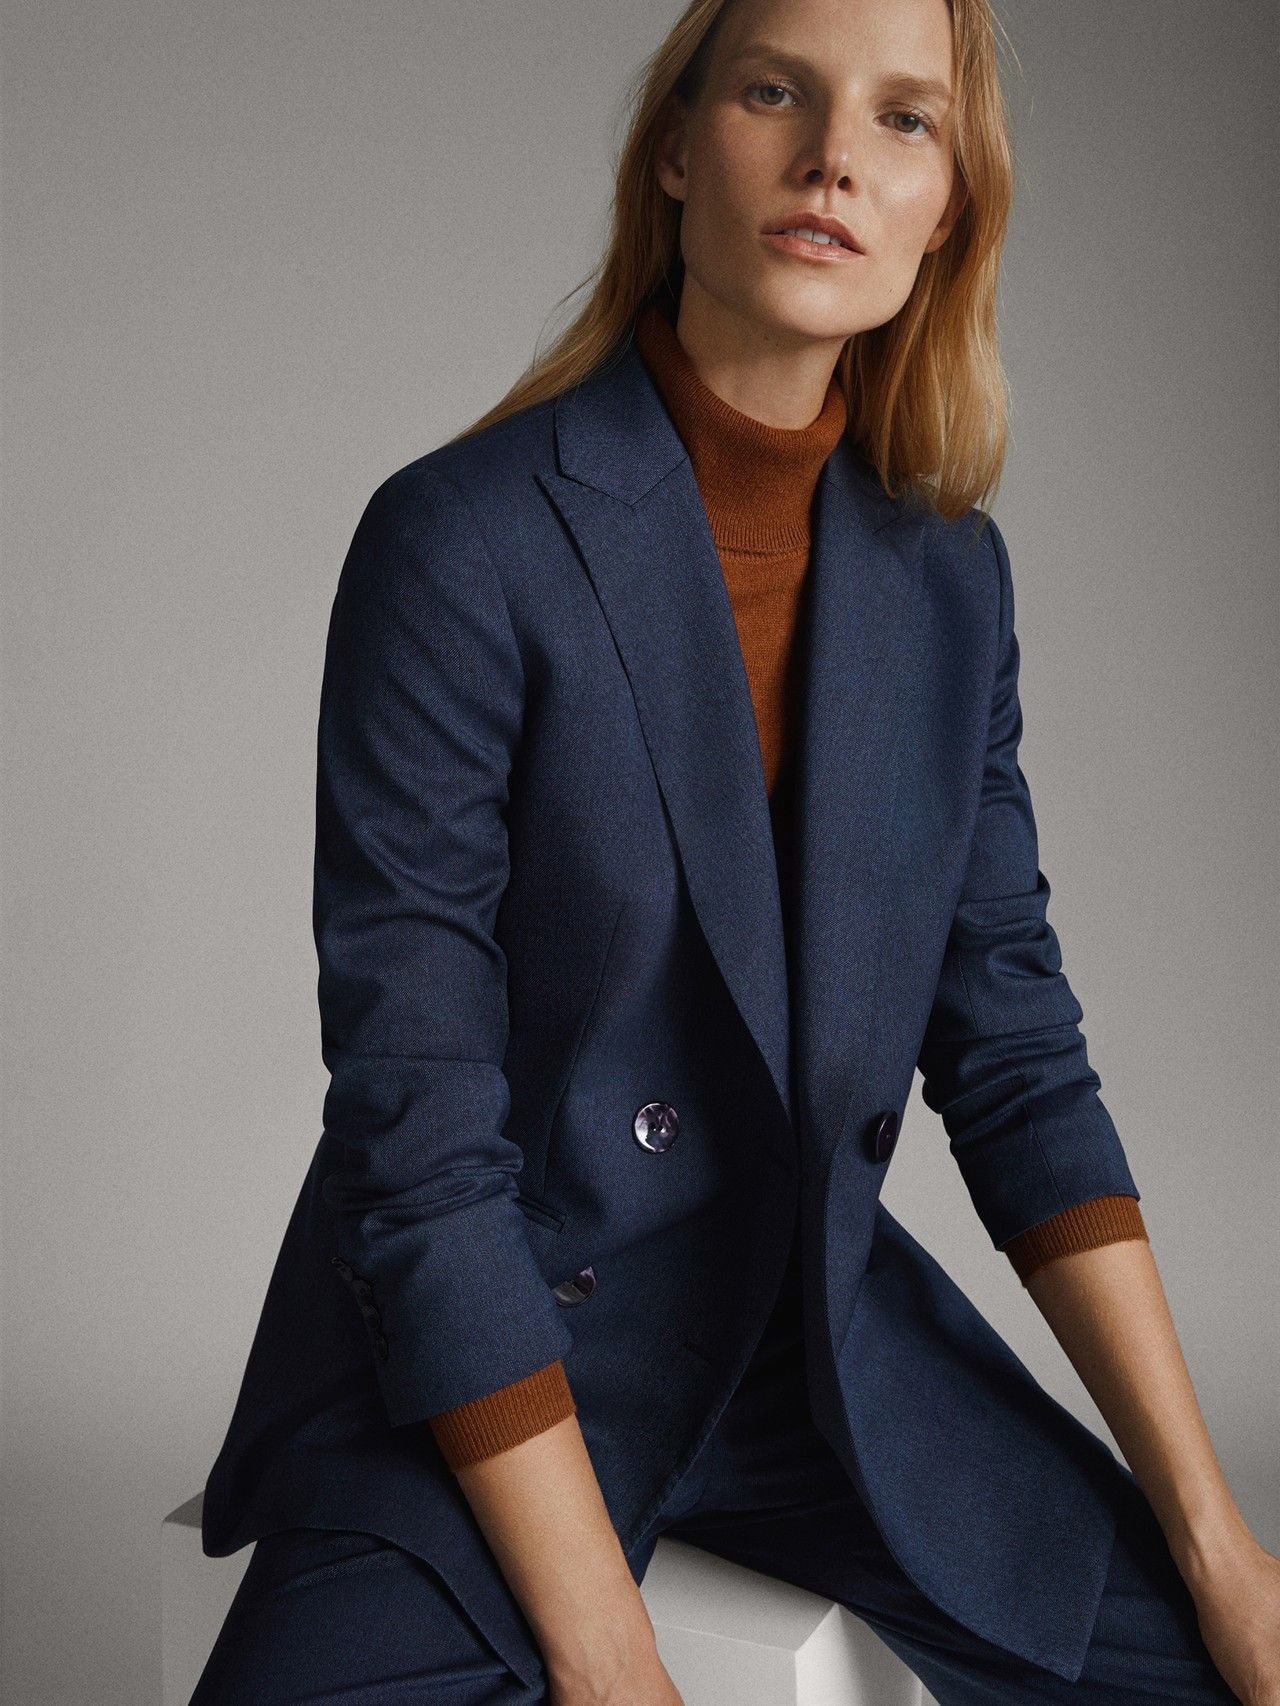 Massimo Dutti Mujer Americana Denim Lana Marino Azul Marino 38 Blue Blazer Women Navy Blue Blazer Women Blue Blazer Outfit